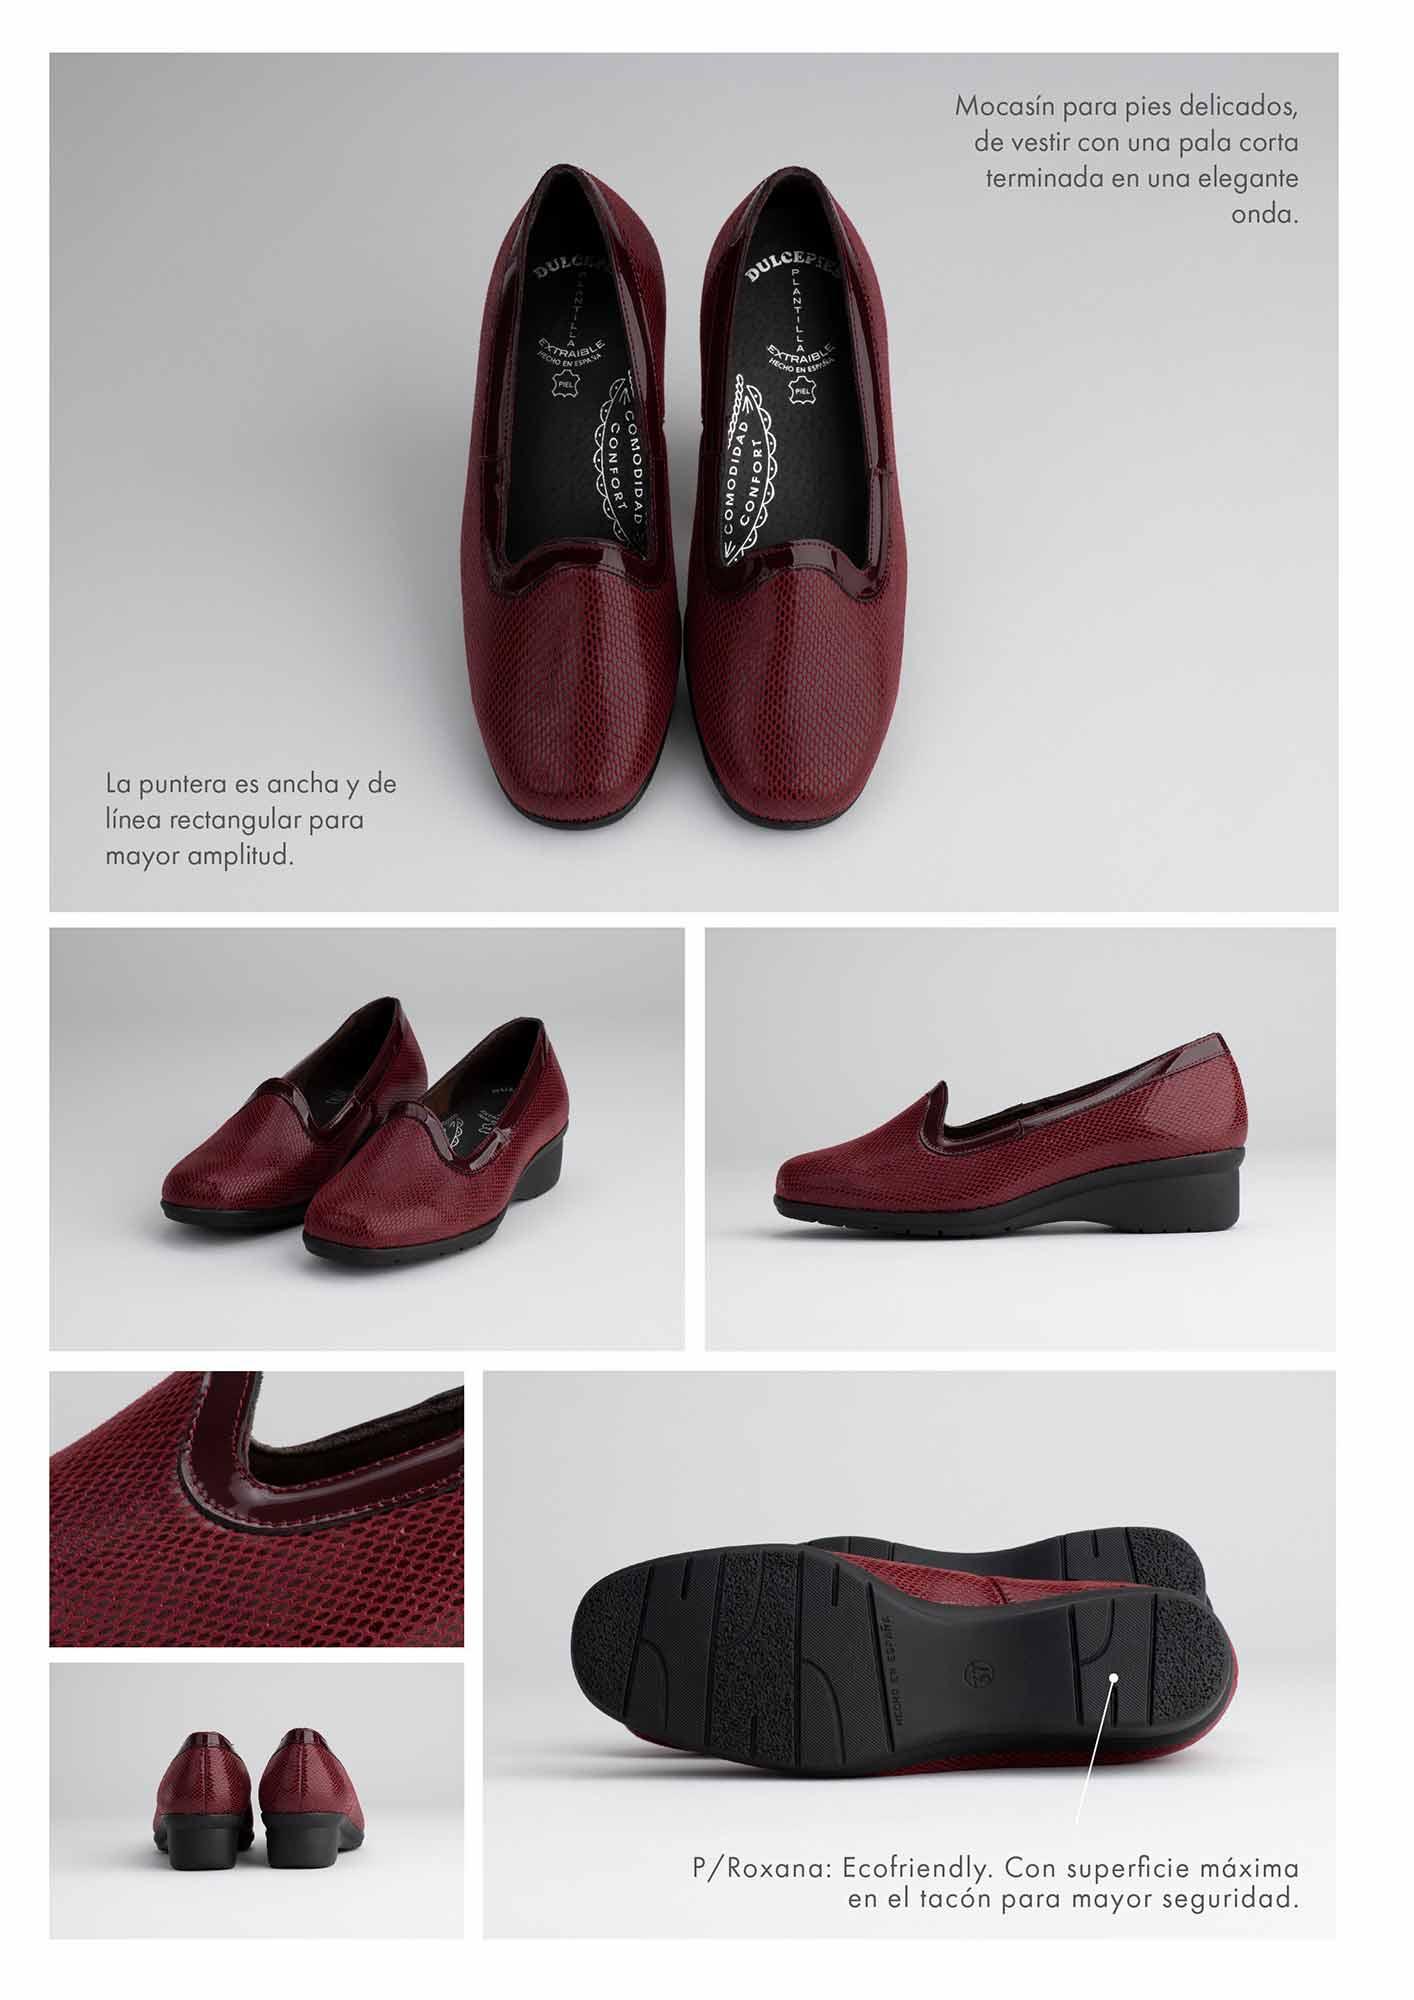 Cátalogo de zapatos de Dulcepies otoño